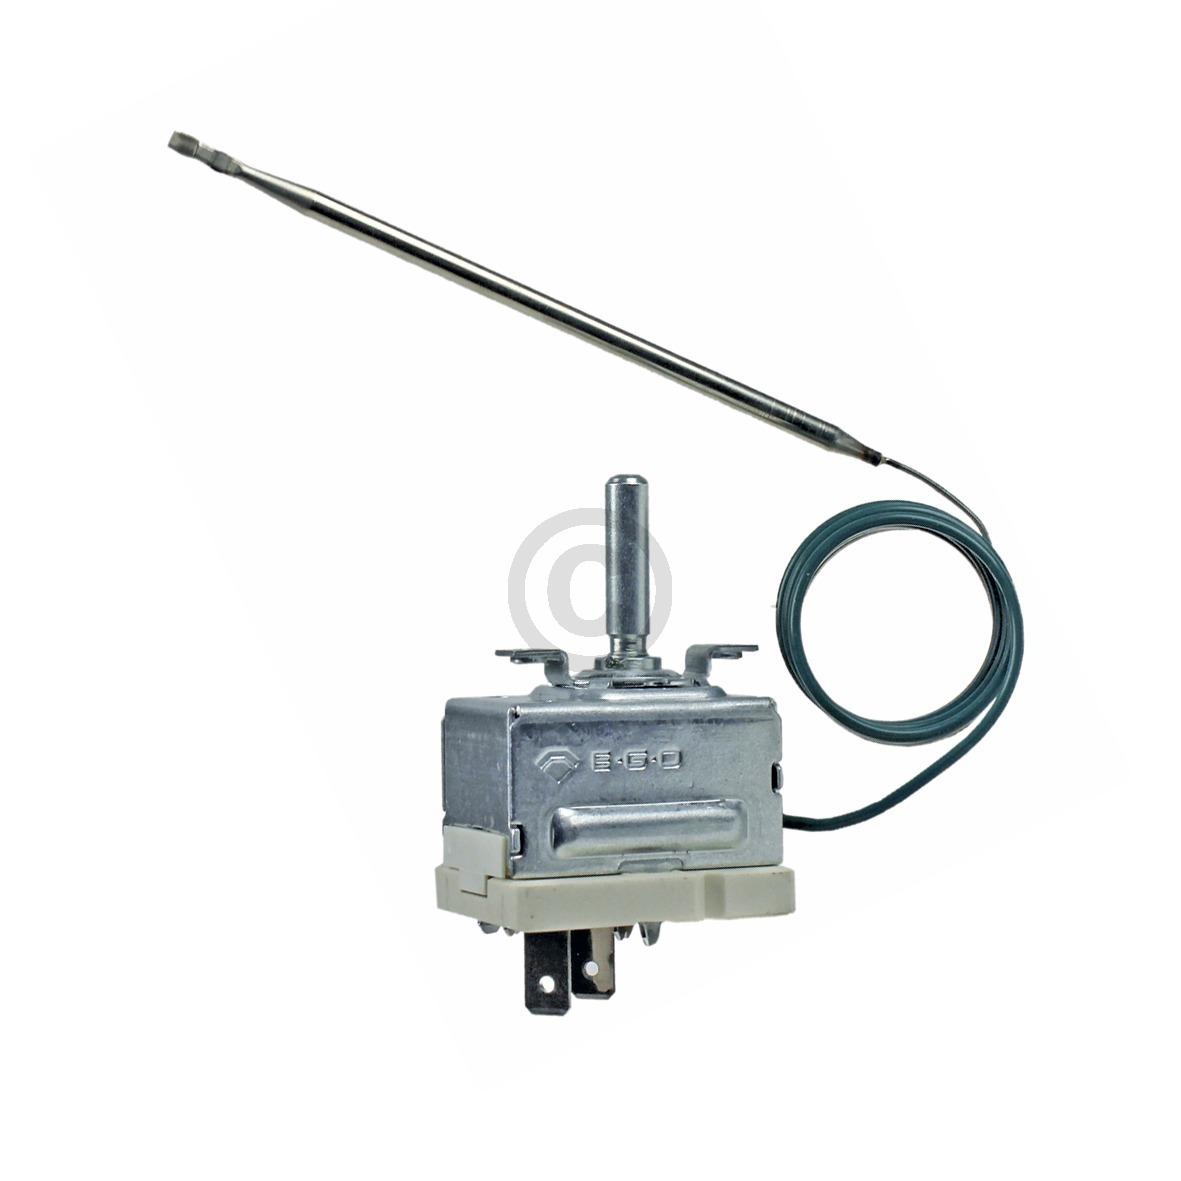 Thermostat ..-345° 55.17062.430 EGO 00658805 658805 Bosch, Siemens, Neff